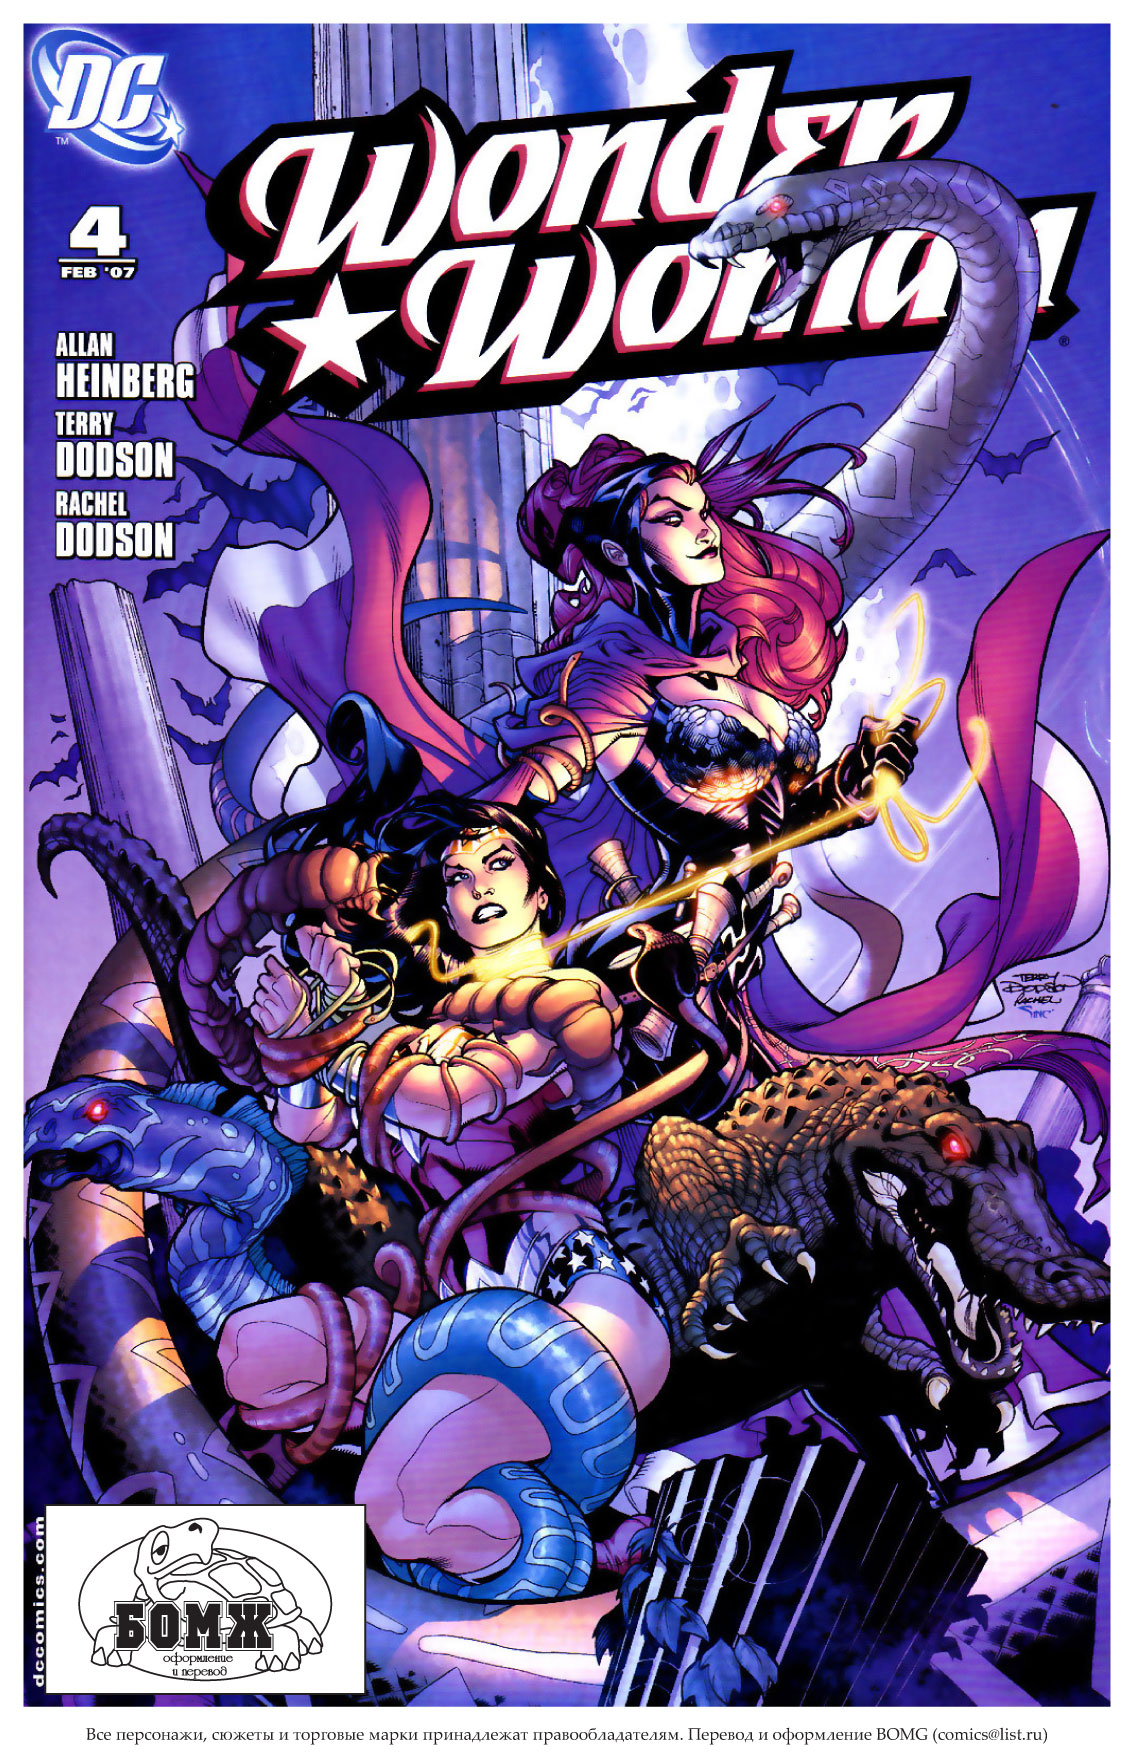 Комиксы Онлайн - Чудо Женщина том 1,2,3 - том 3 # 4 - Страница №1 - Wonder Woman vol 1,2,3 - v3 # 4